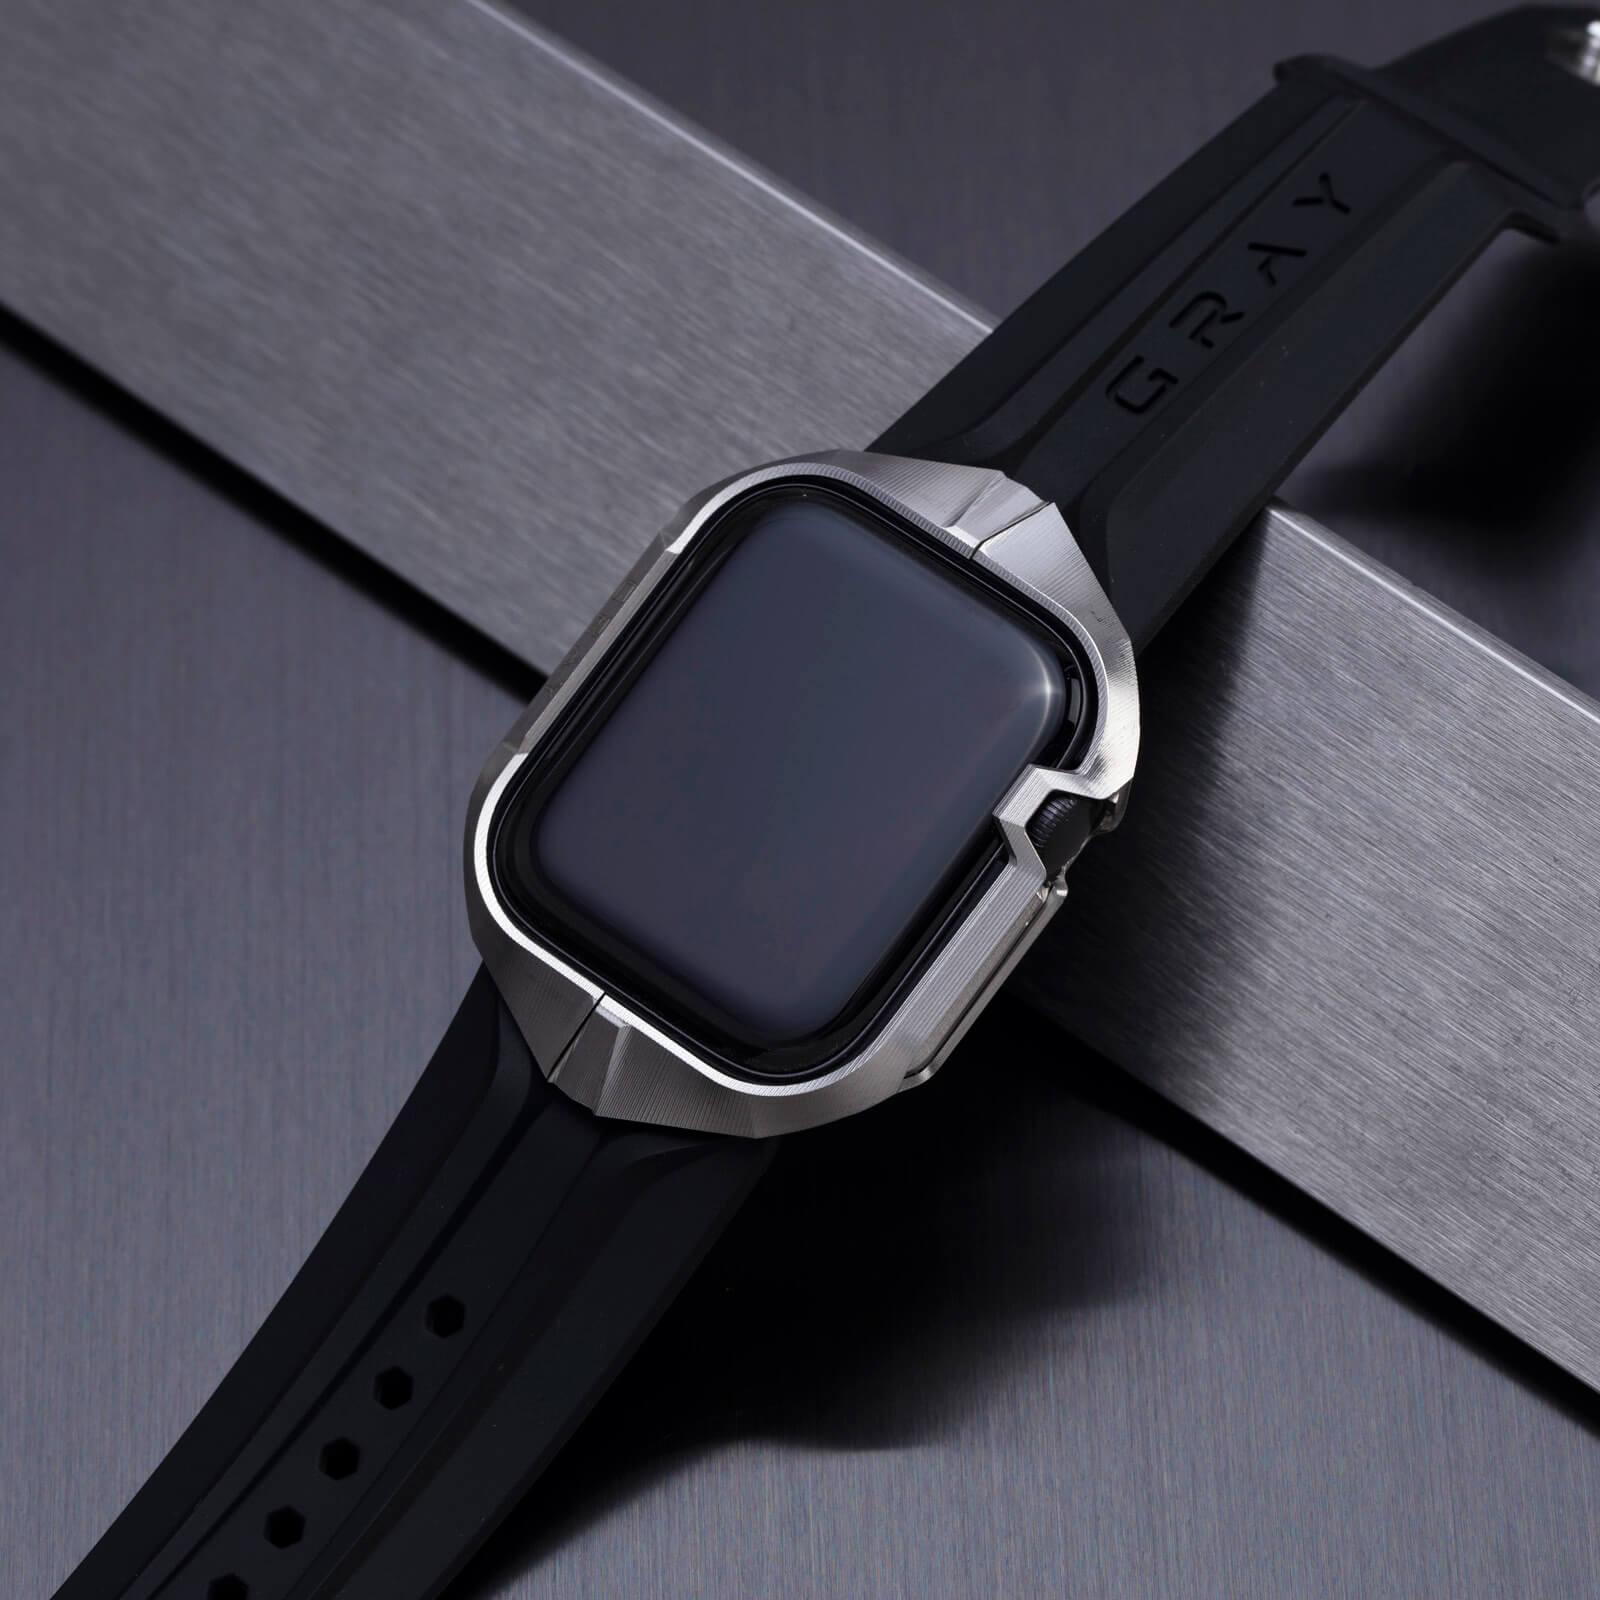 cyber watch titanium, luxury designer titanium metal apple watch case